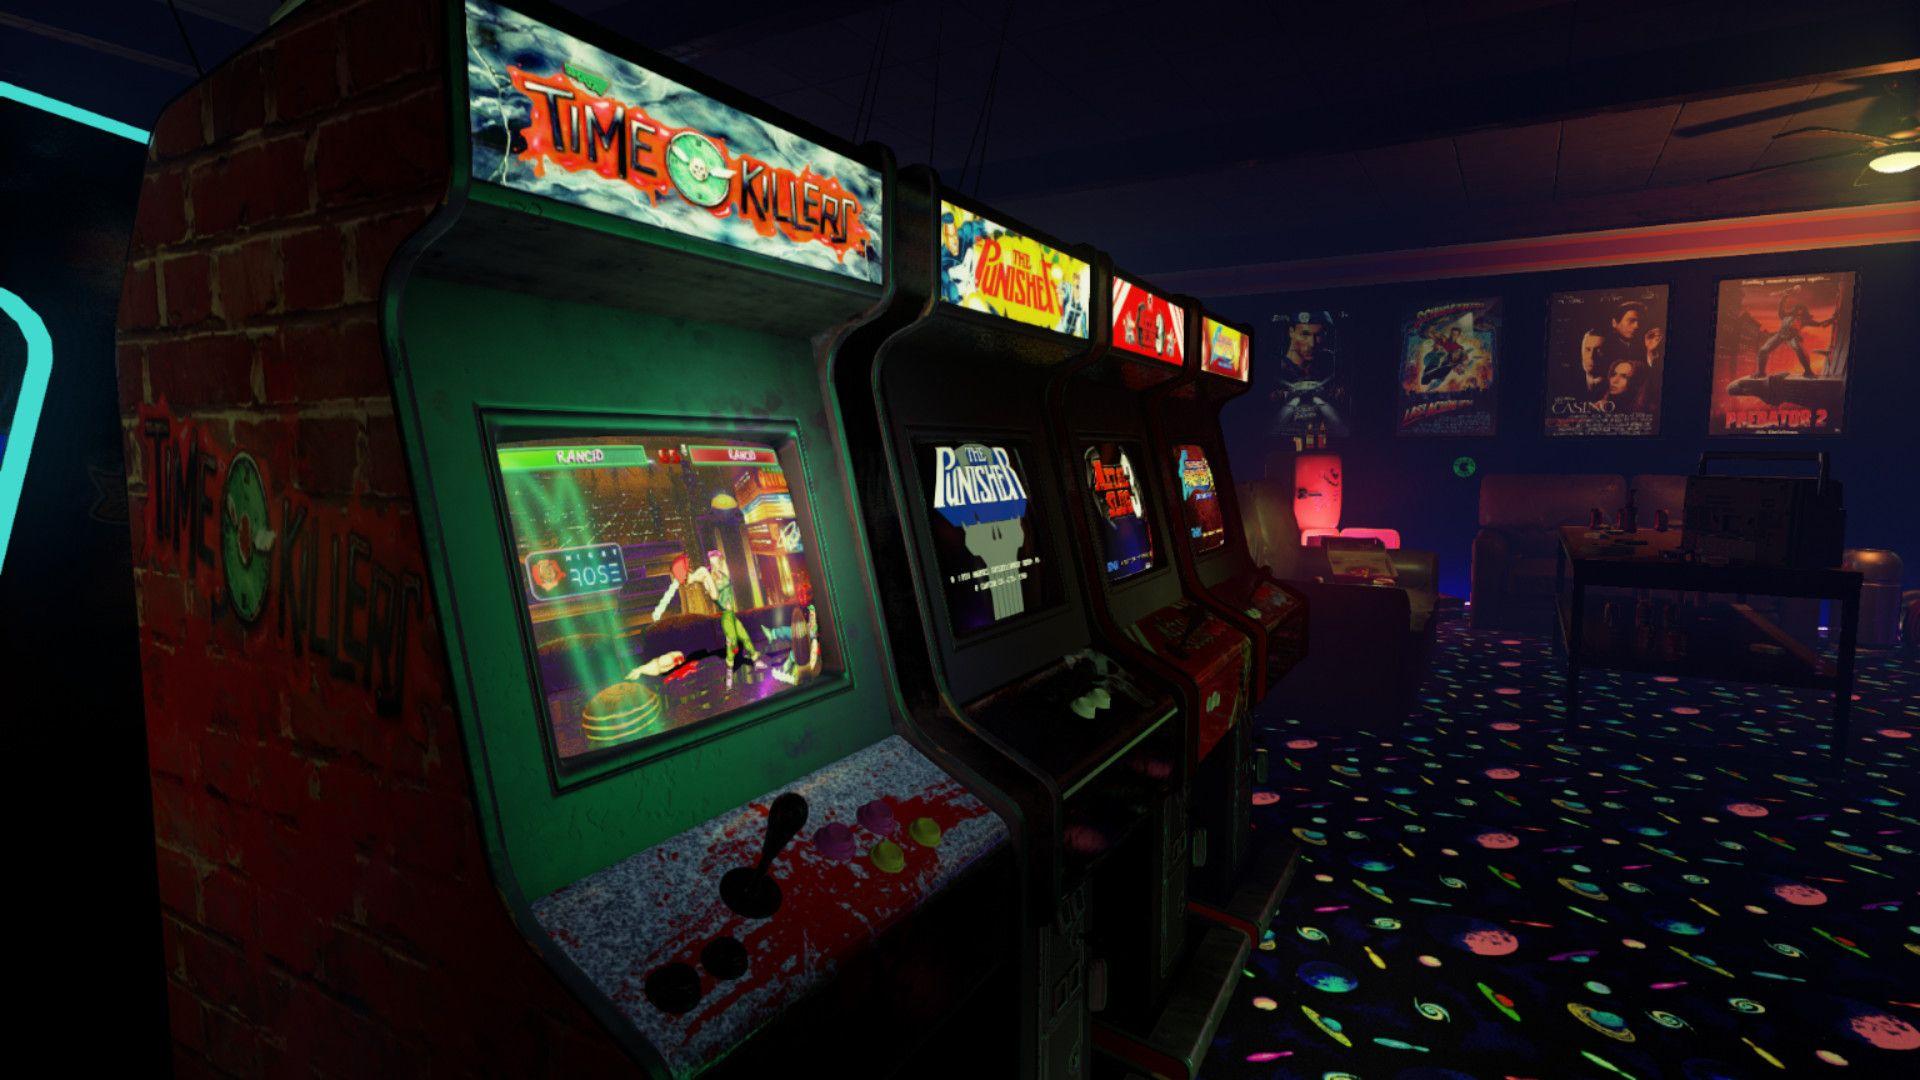 Res 1920x1080 Retro Arcade Arcade Retro Arcade Machine